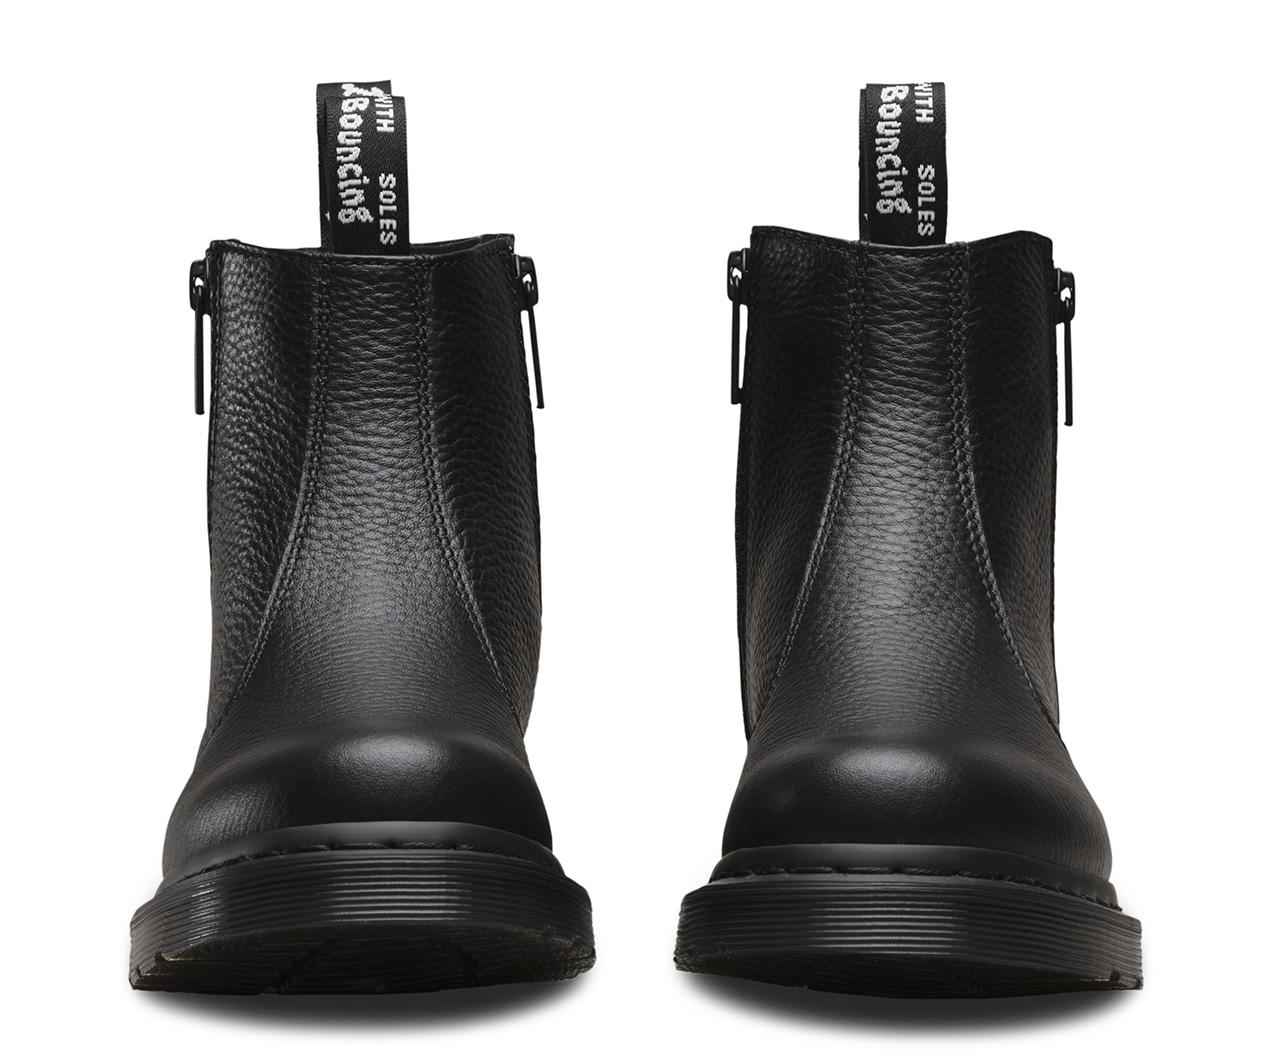 6edc4cf1dc 2976 W/ ZIP AUNT SALLY | 2976 Chelsea Boots | Canada